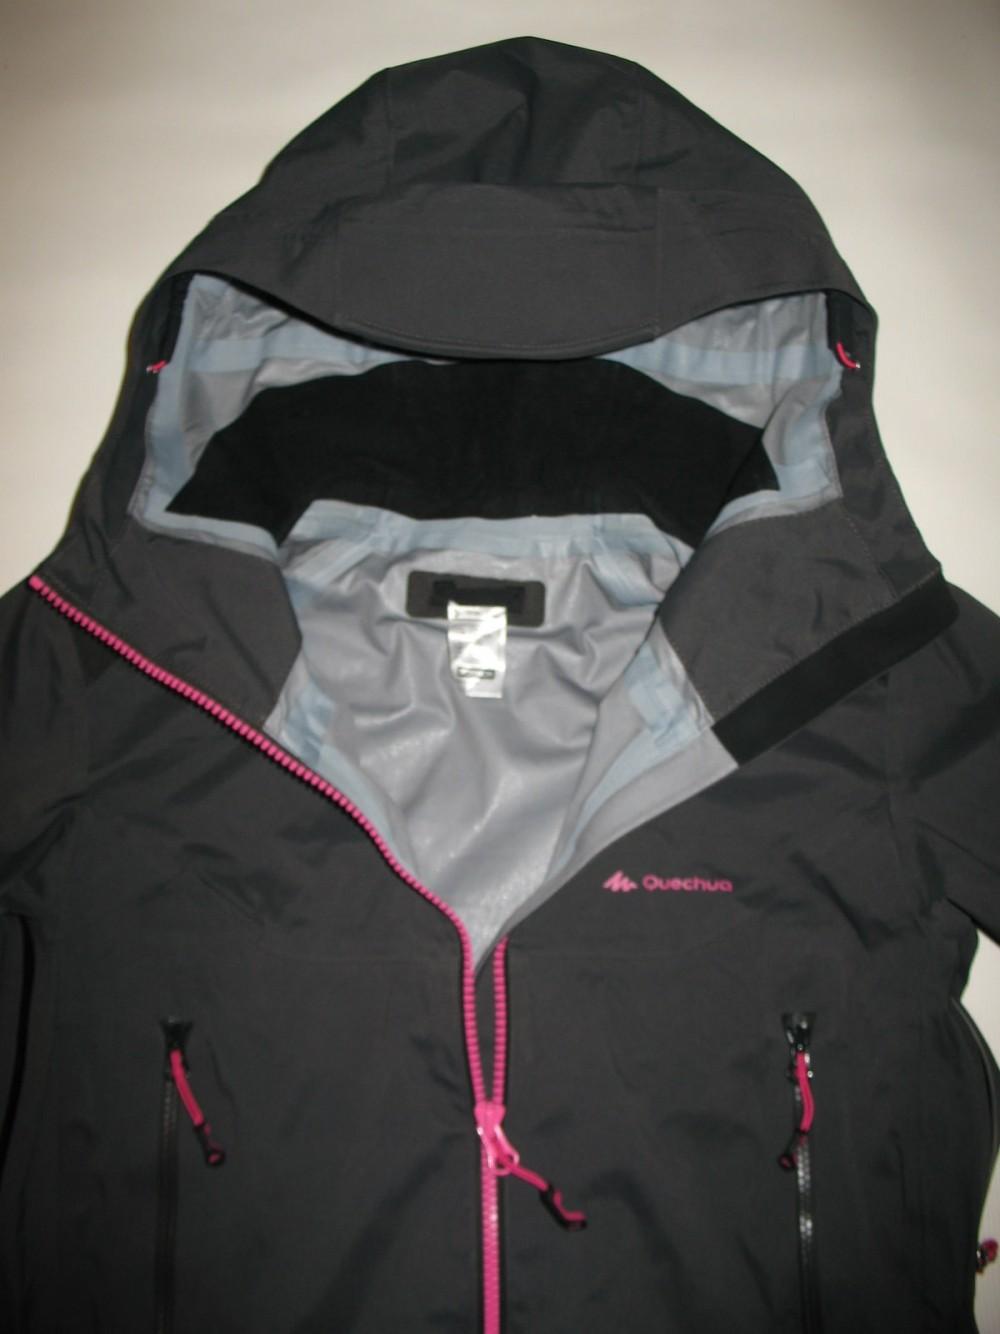 Куртка QUECHUA forclaz 900 l jacket lady (размер XS/S) - 6